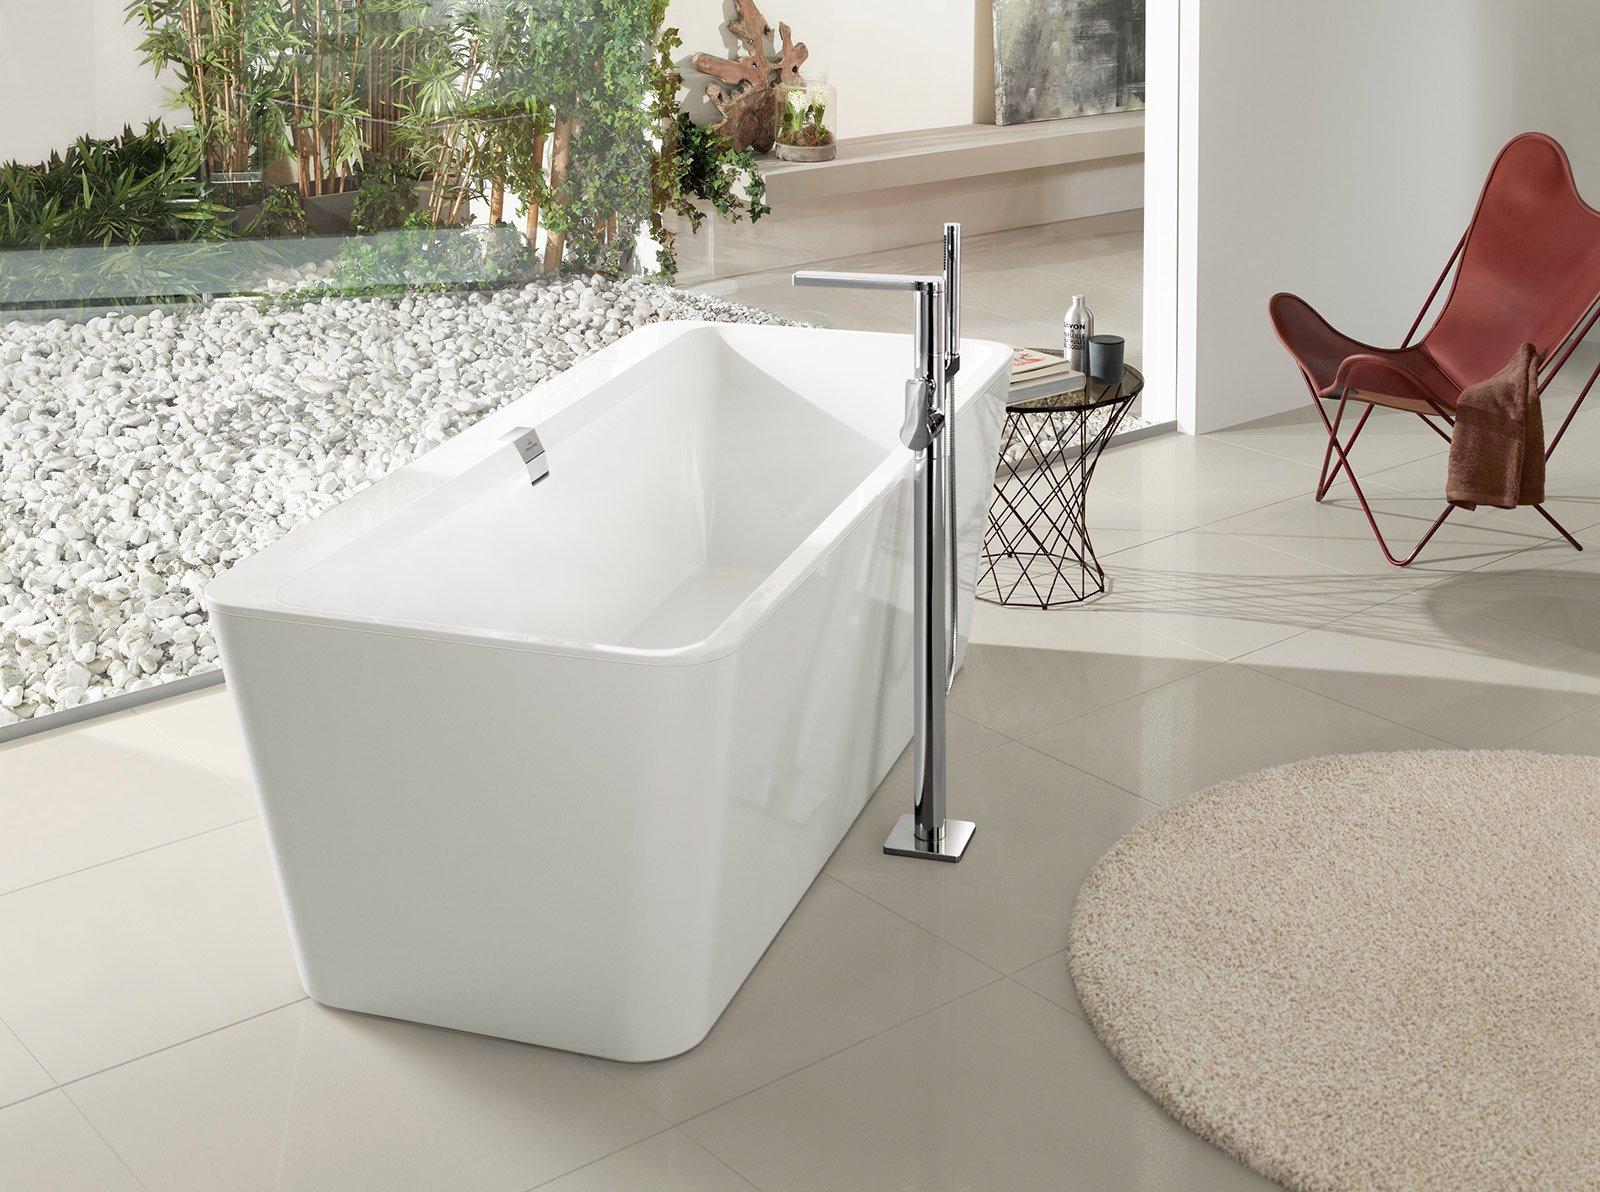 Vasche da bagno novit del cersaie 2013 cose di casa - Vasche da bagno rotonde ...